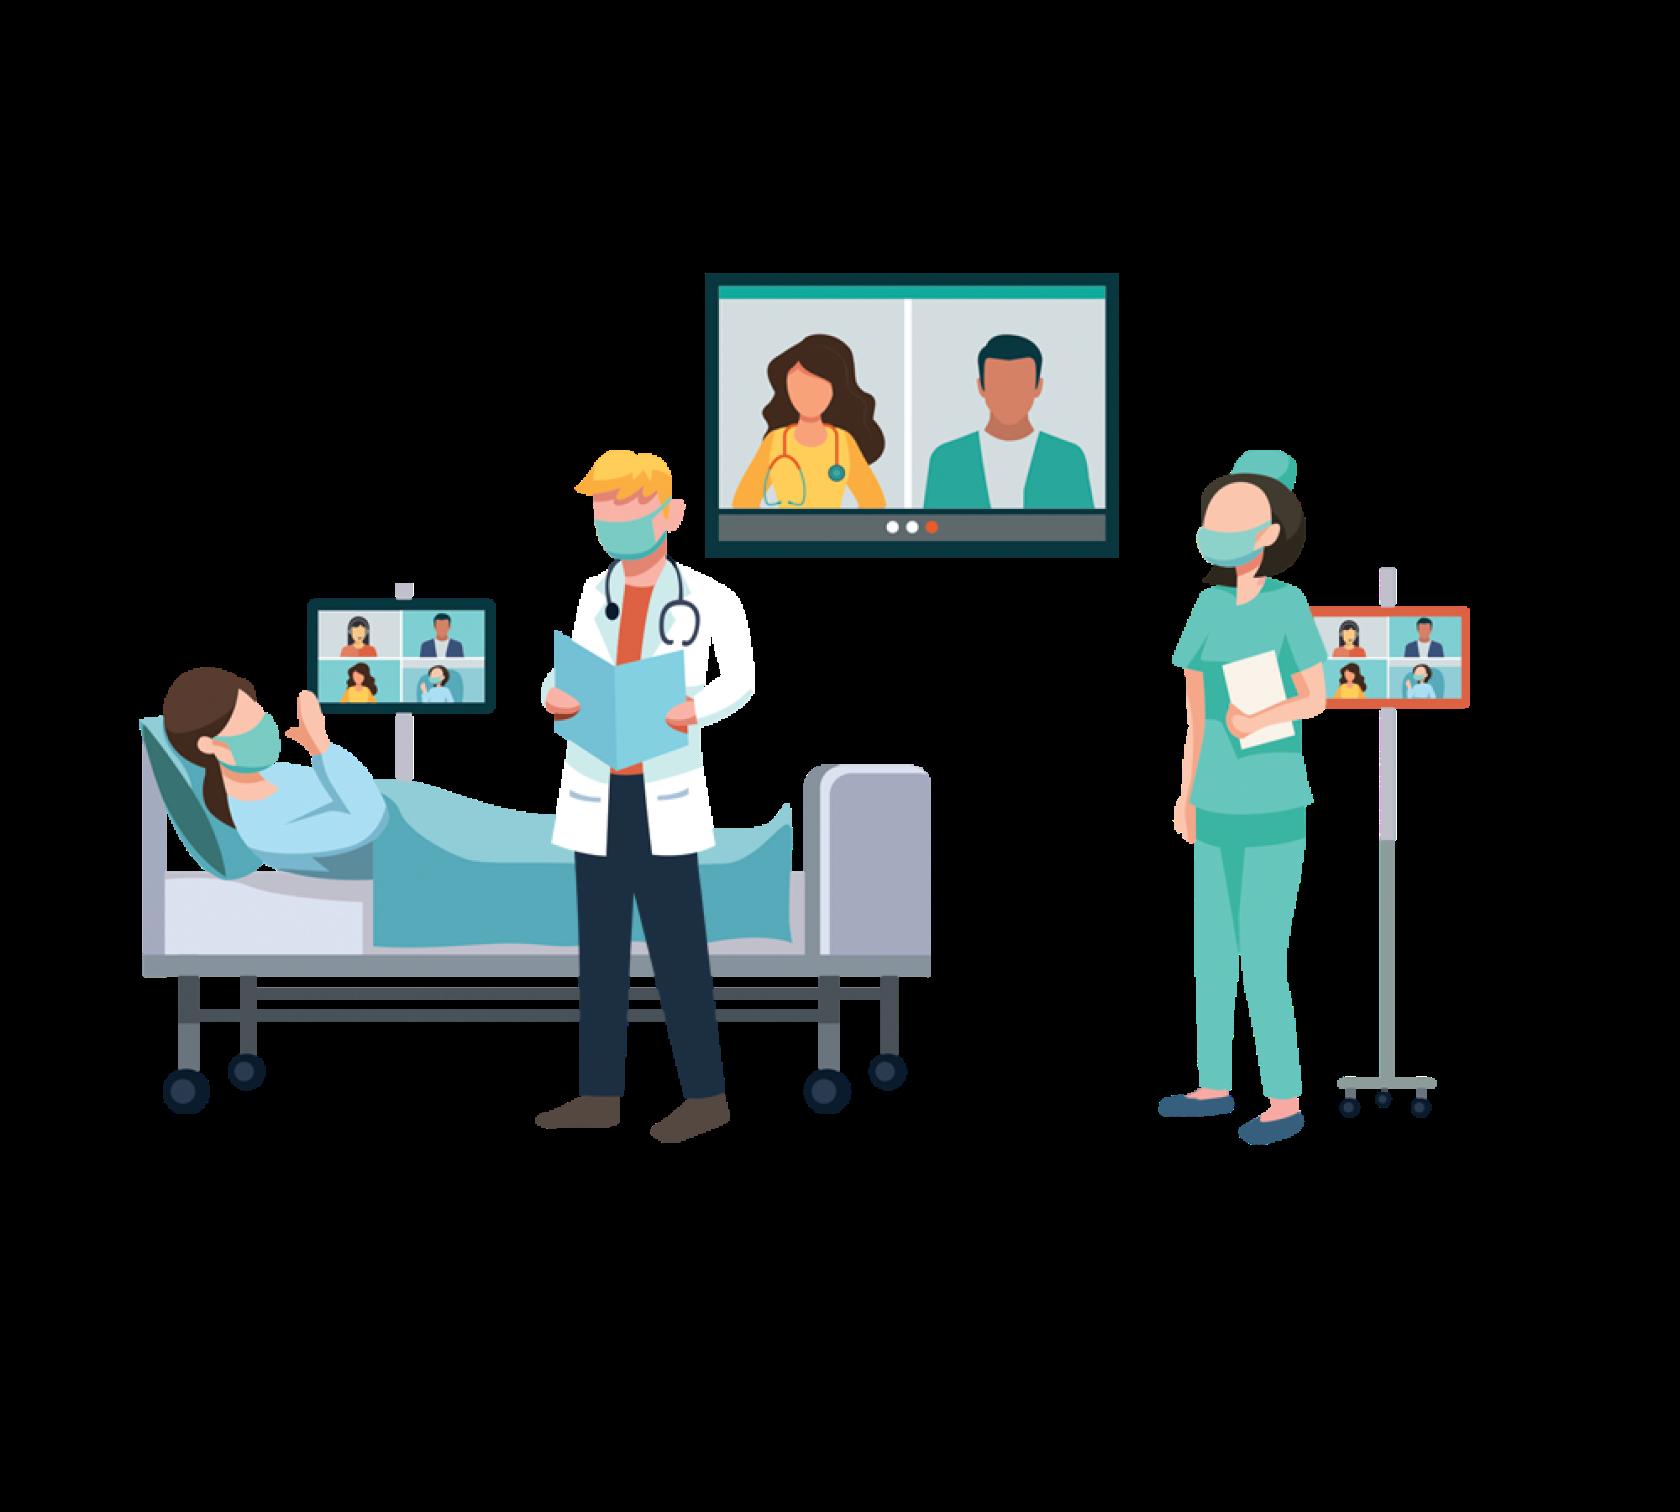 future inpatient care room illustration